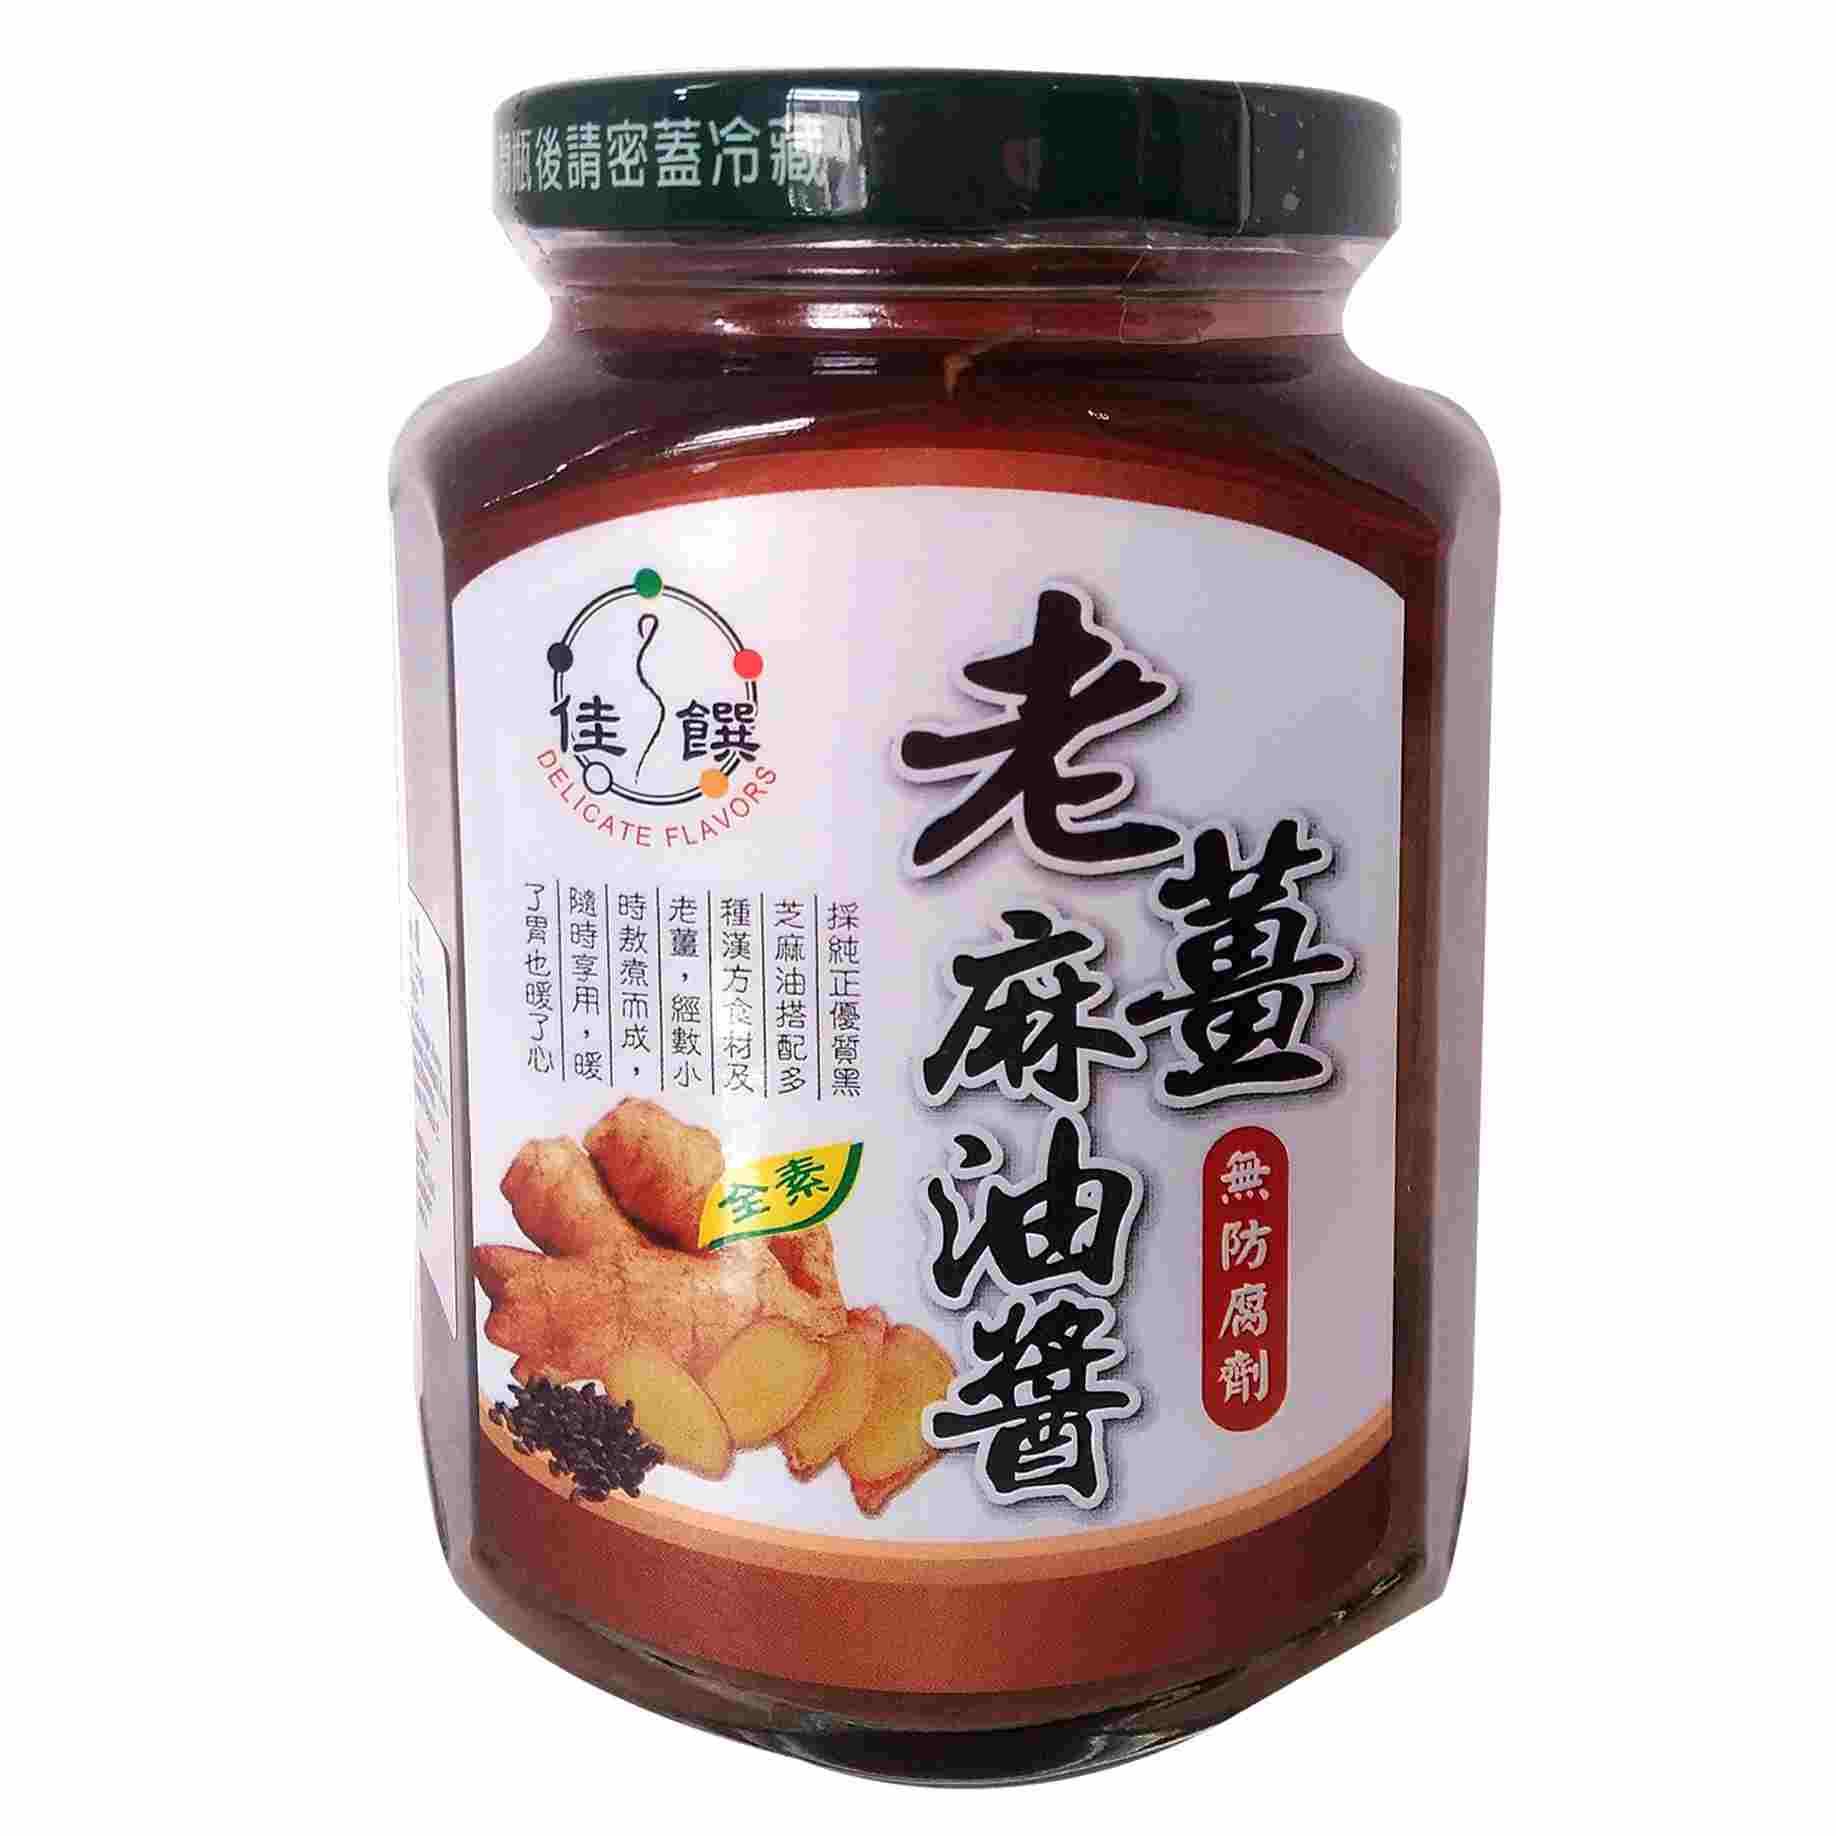 Image Ginger Sesame Sauce 佳饌 - 老薑麻油醬 370grams